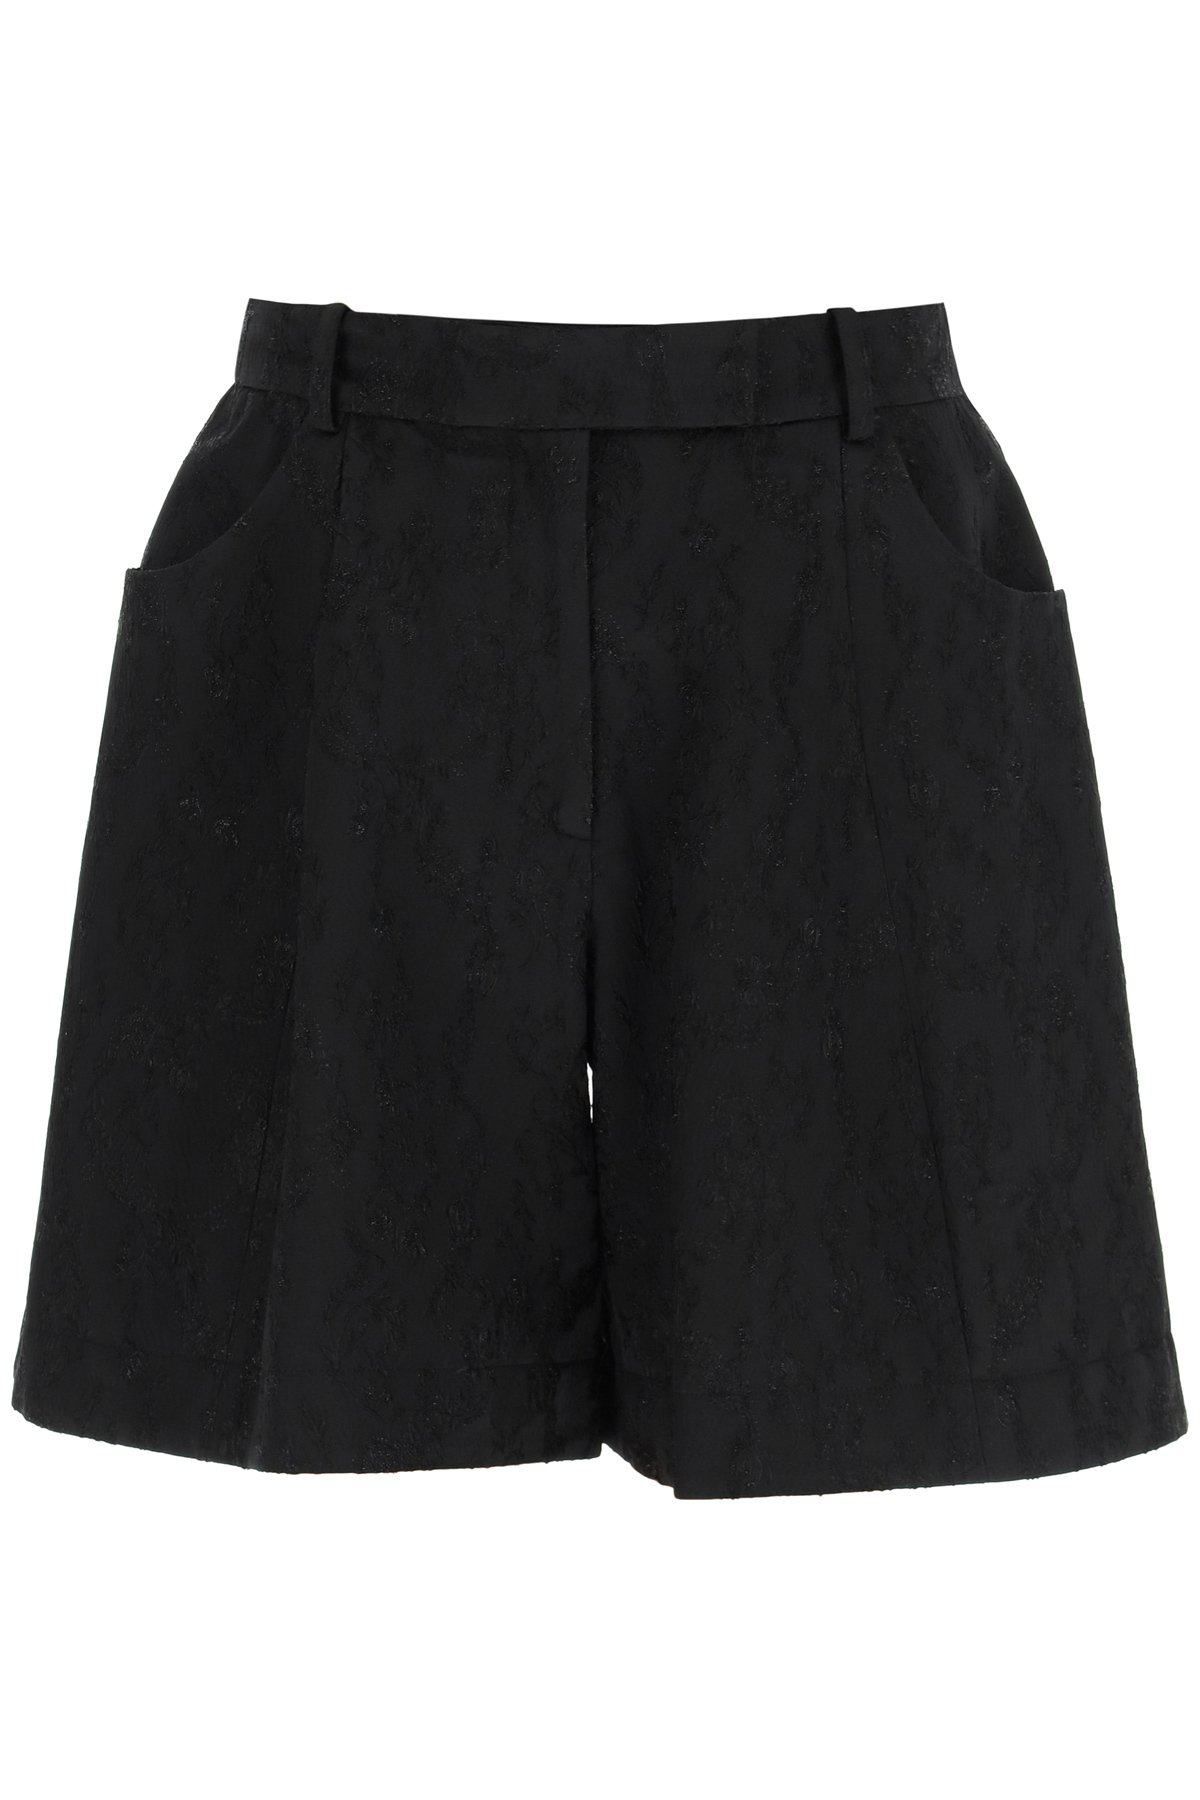 Simone rocha shorts sagomati ricamati